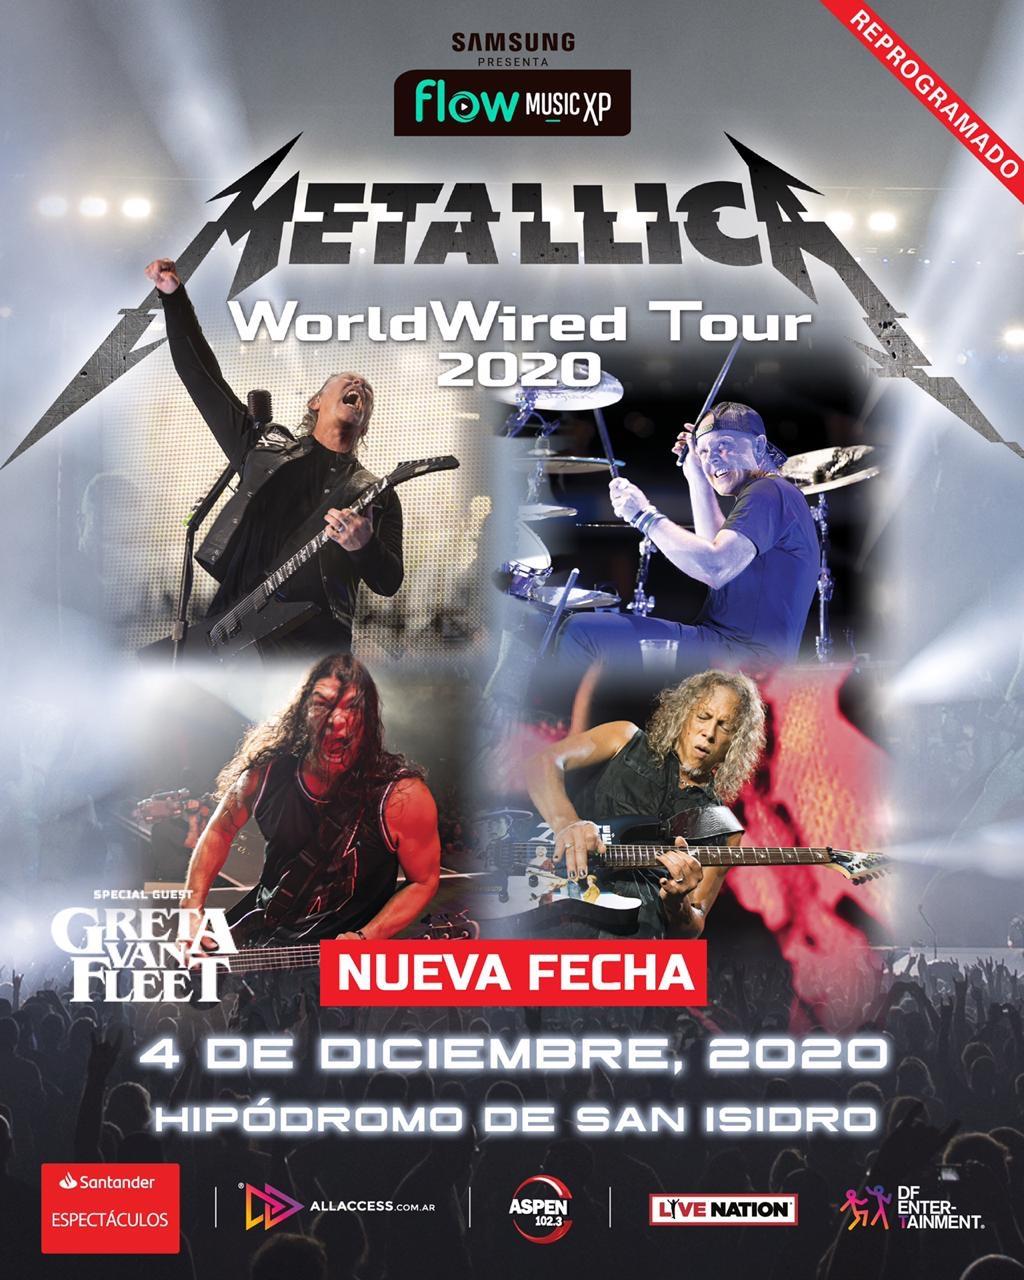 METALLICA en Argentina | Show REPROGRAMADO Viernes 4 de diciembre – Hipódromo de San Isidro